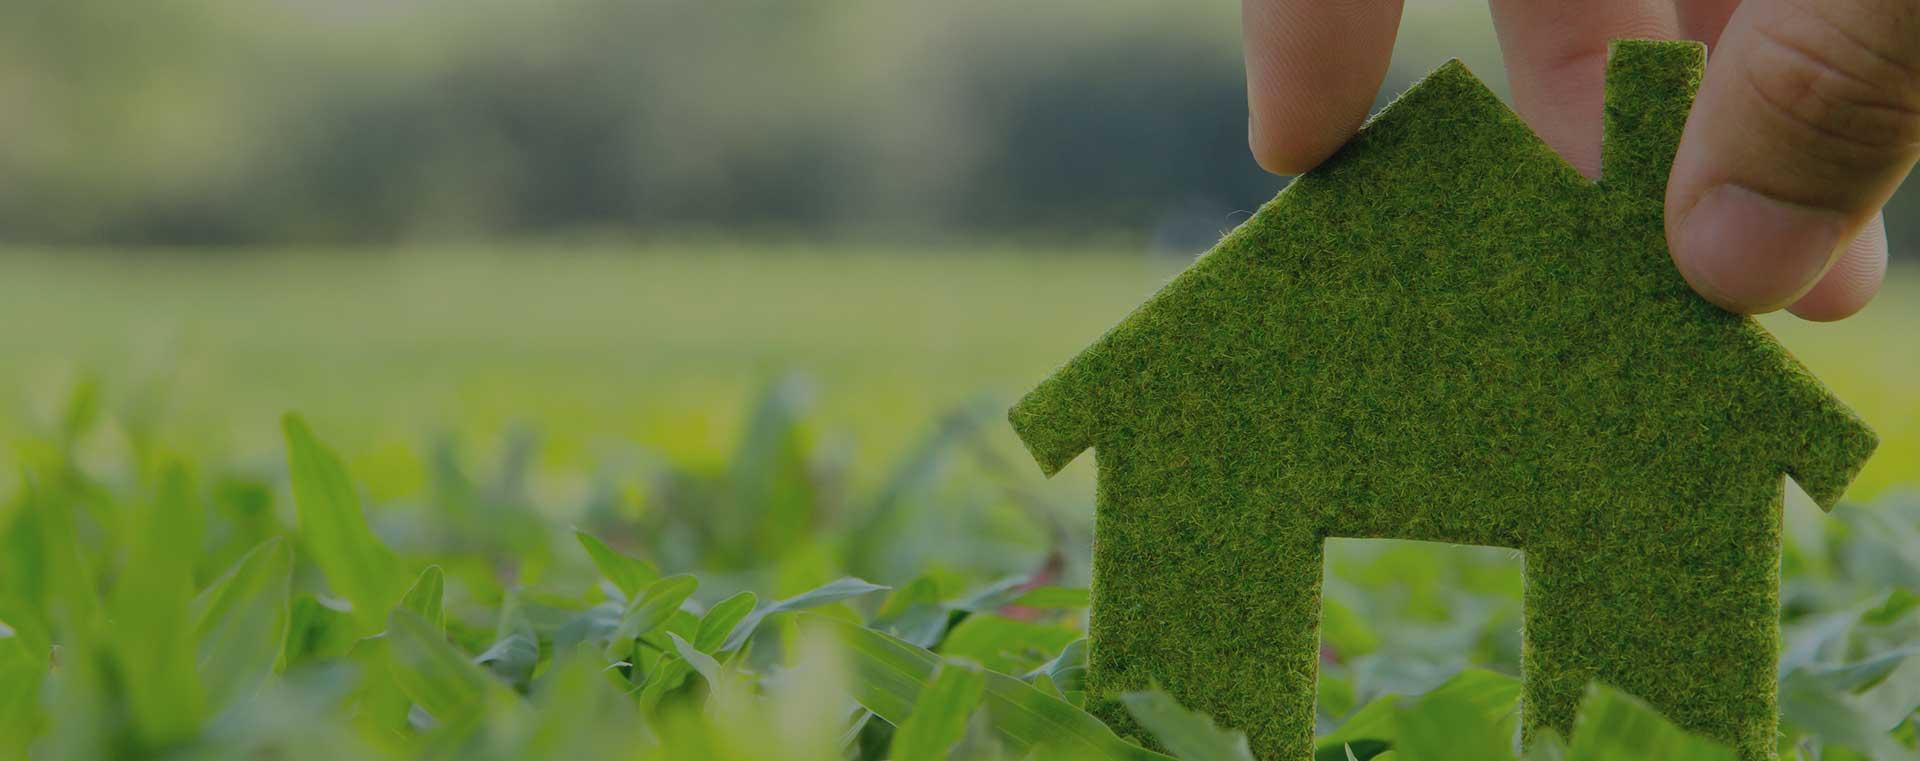 stavebni ekologicka tepelna izolace setrna k prirode